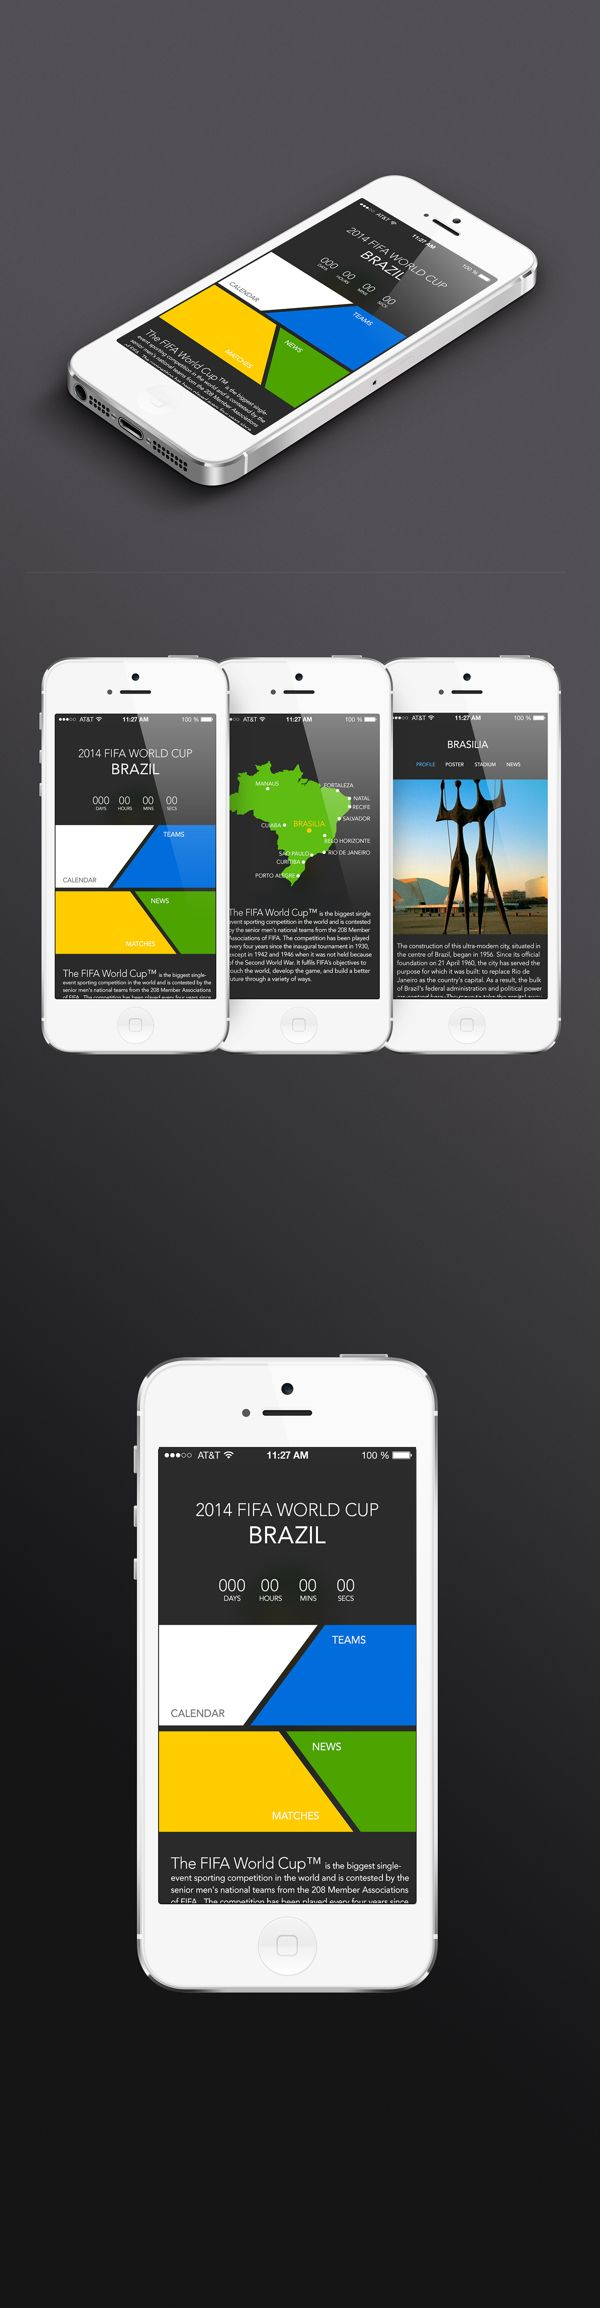 2014 Brazil world cup app UI (Concept design) by Hyelim Choi, via Behance